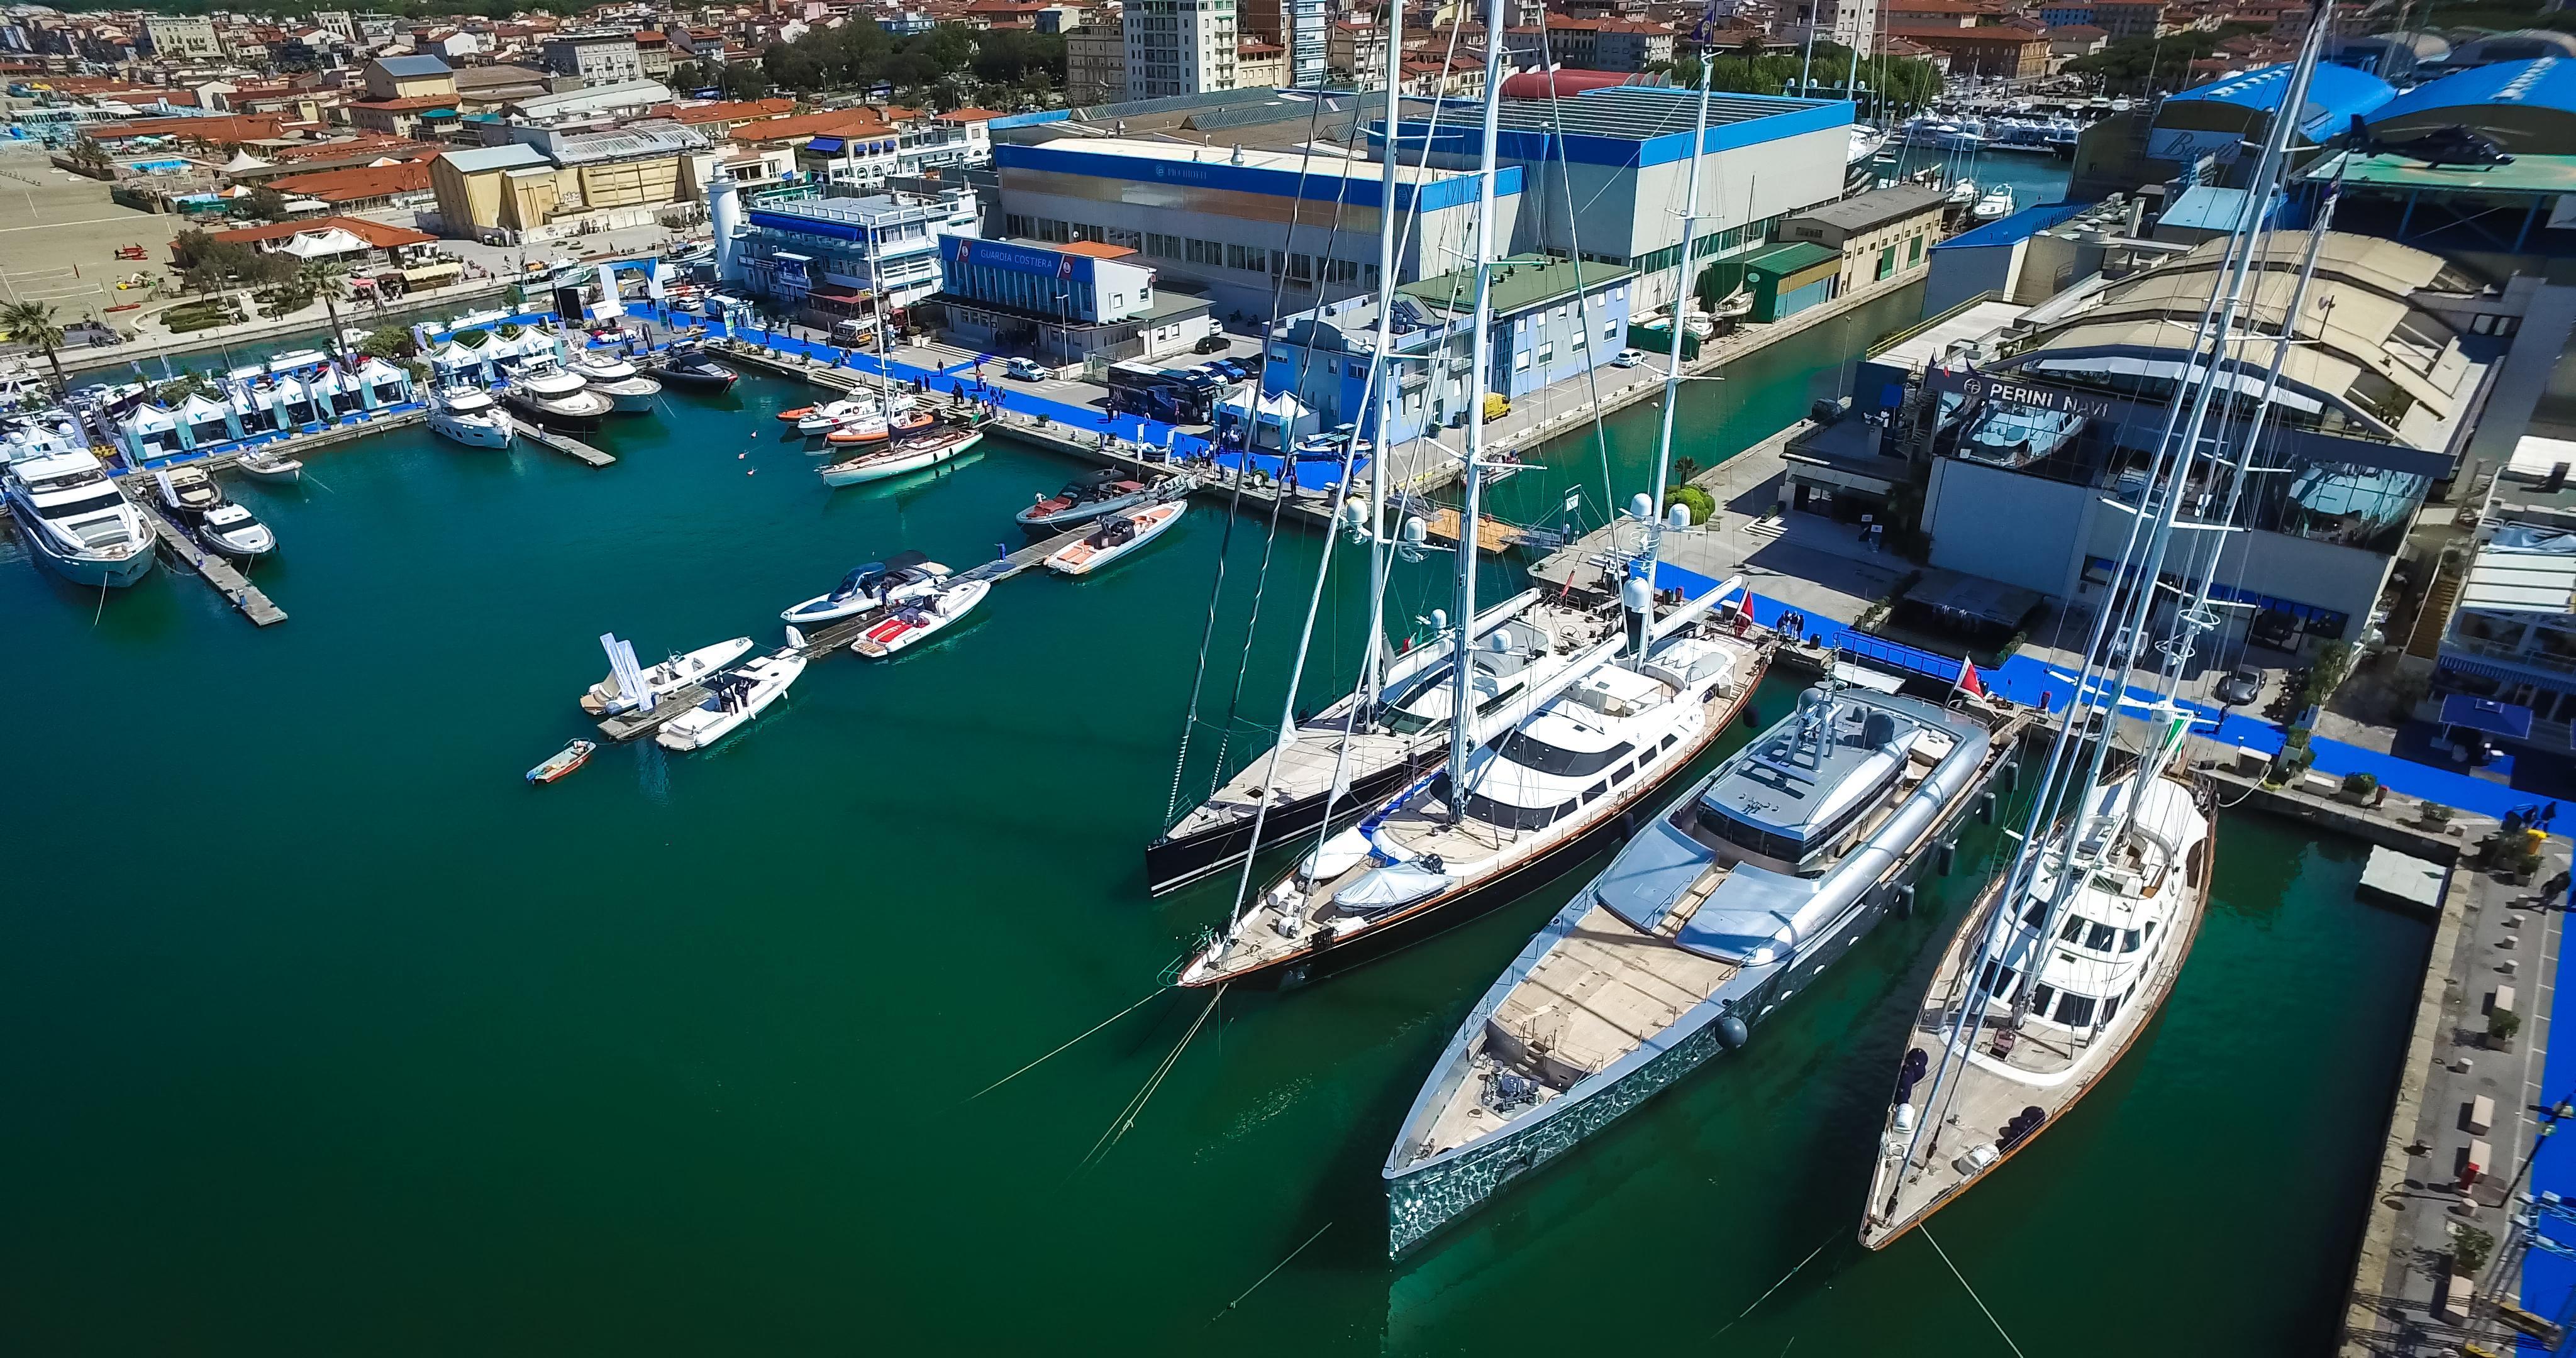 Versilia portuale regionale autorità portuale regionale